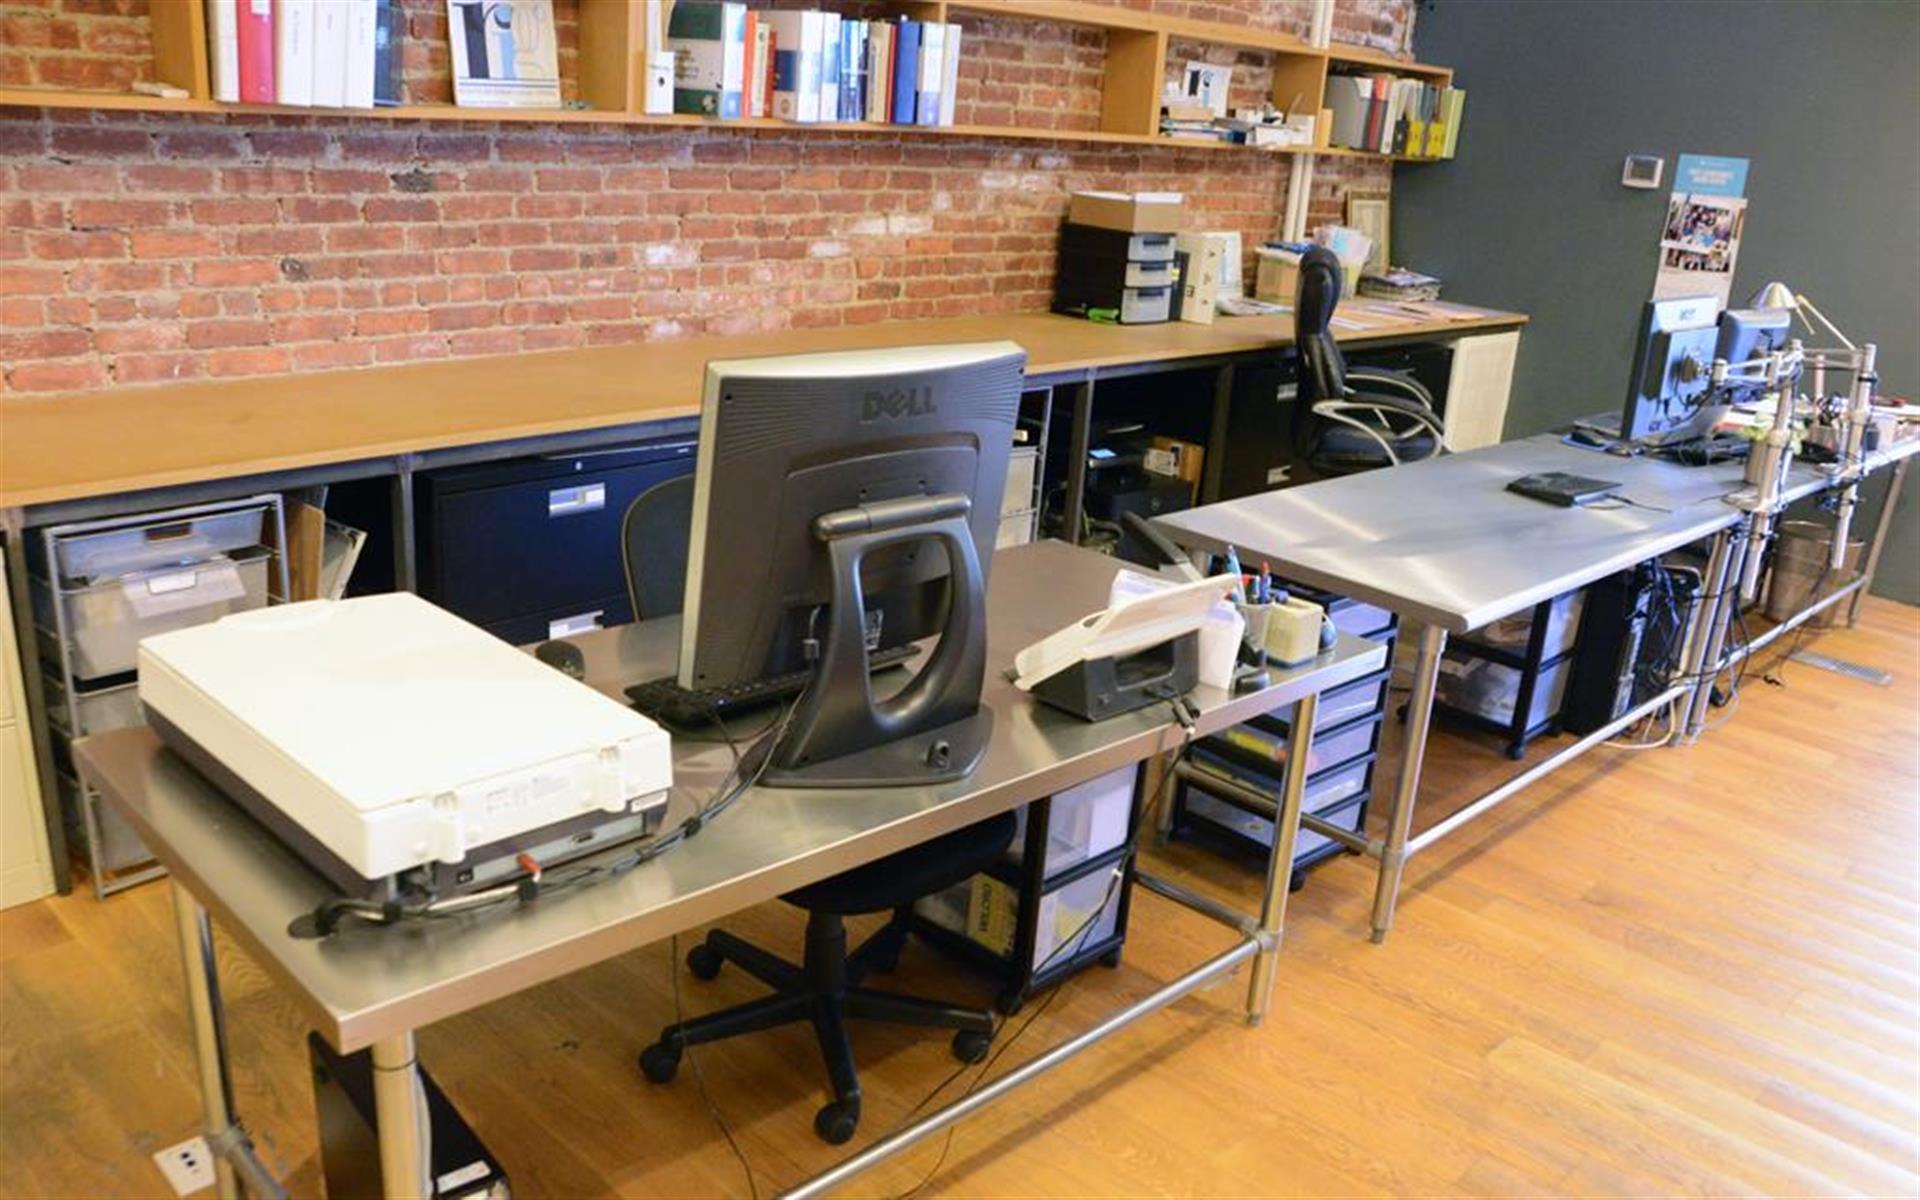 NJ Office Share - Union City, NJ - Dedicated Desk